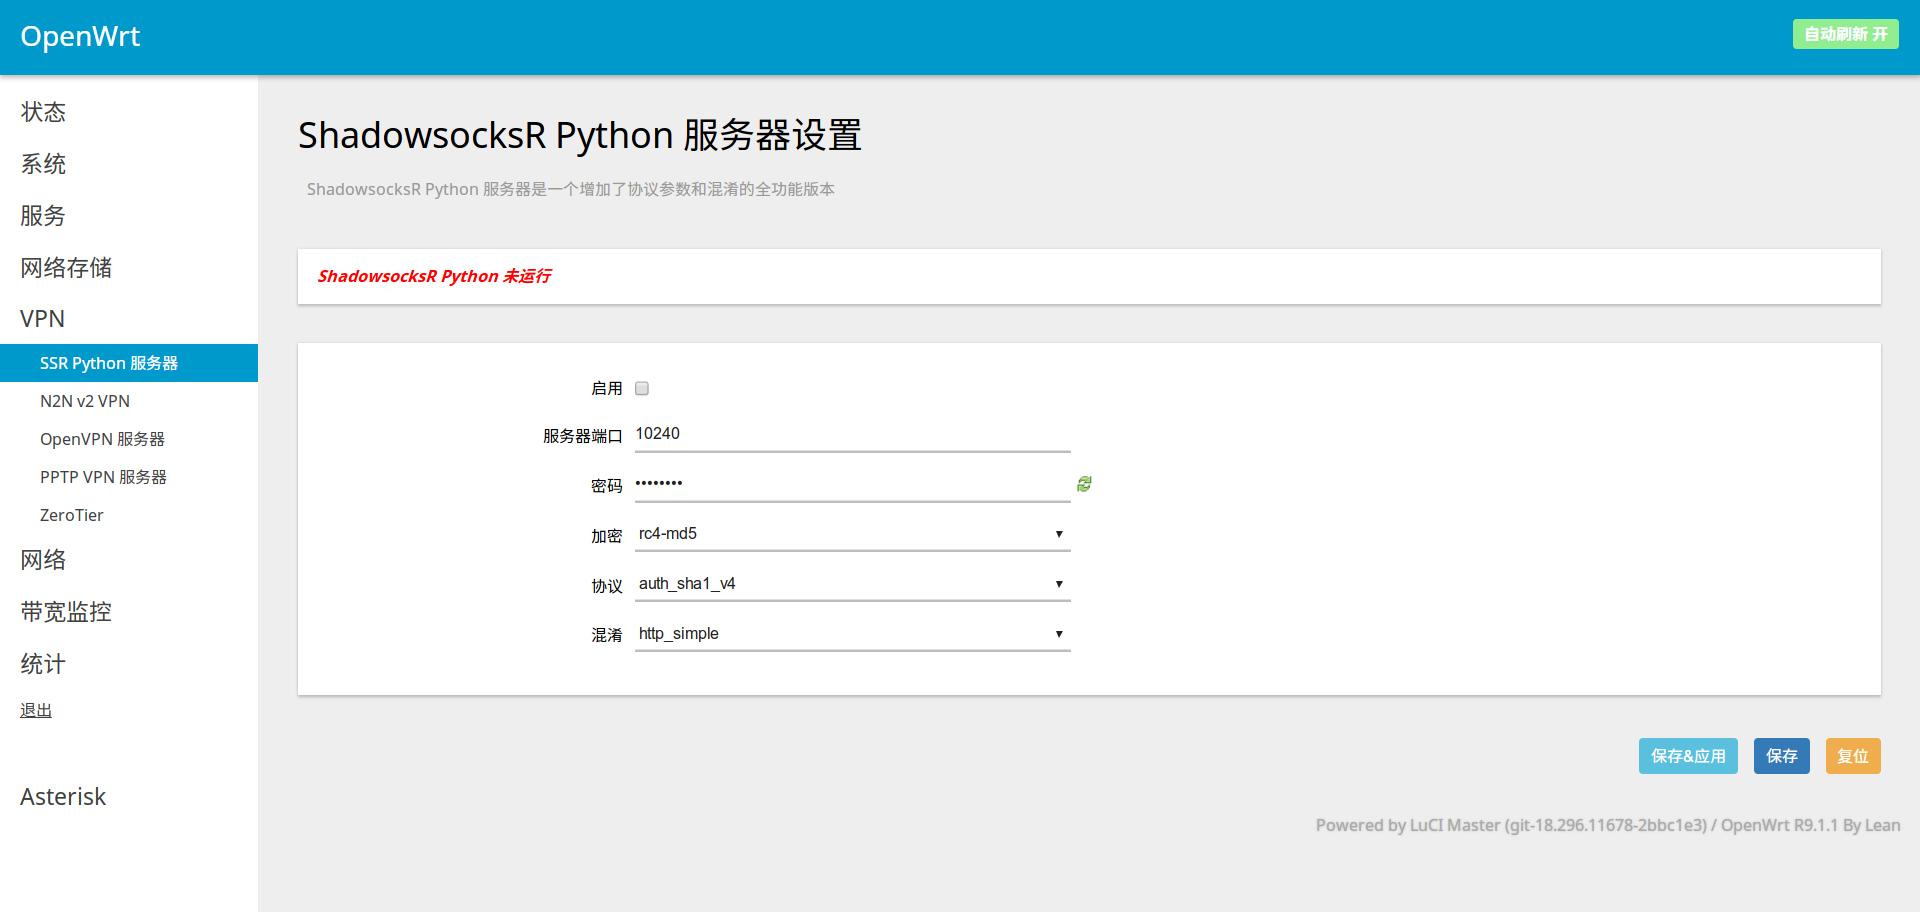 SSR Python 服务器